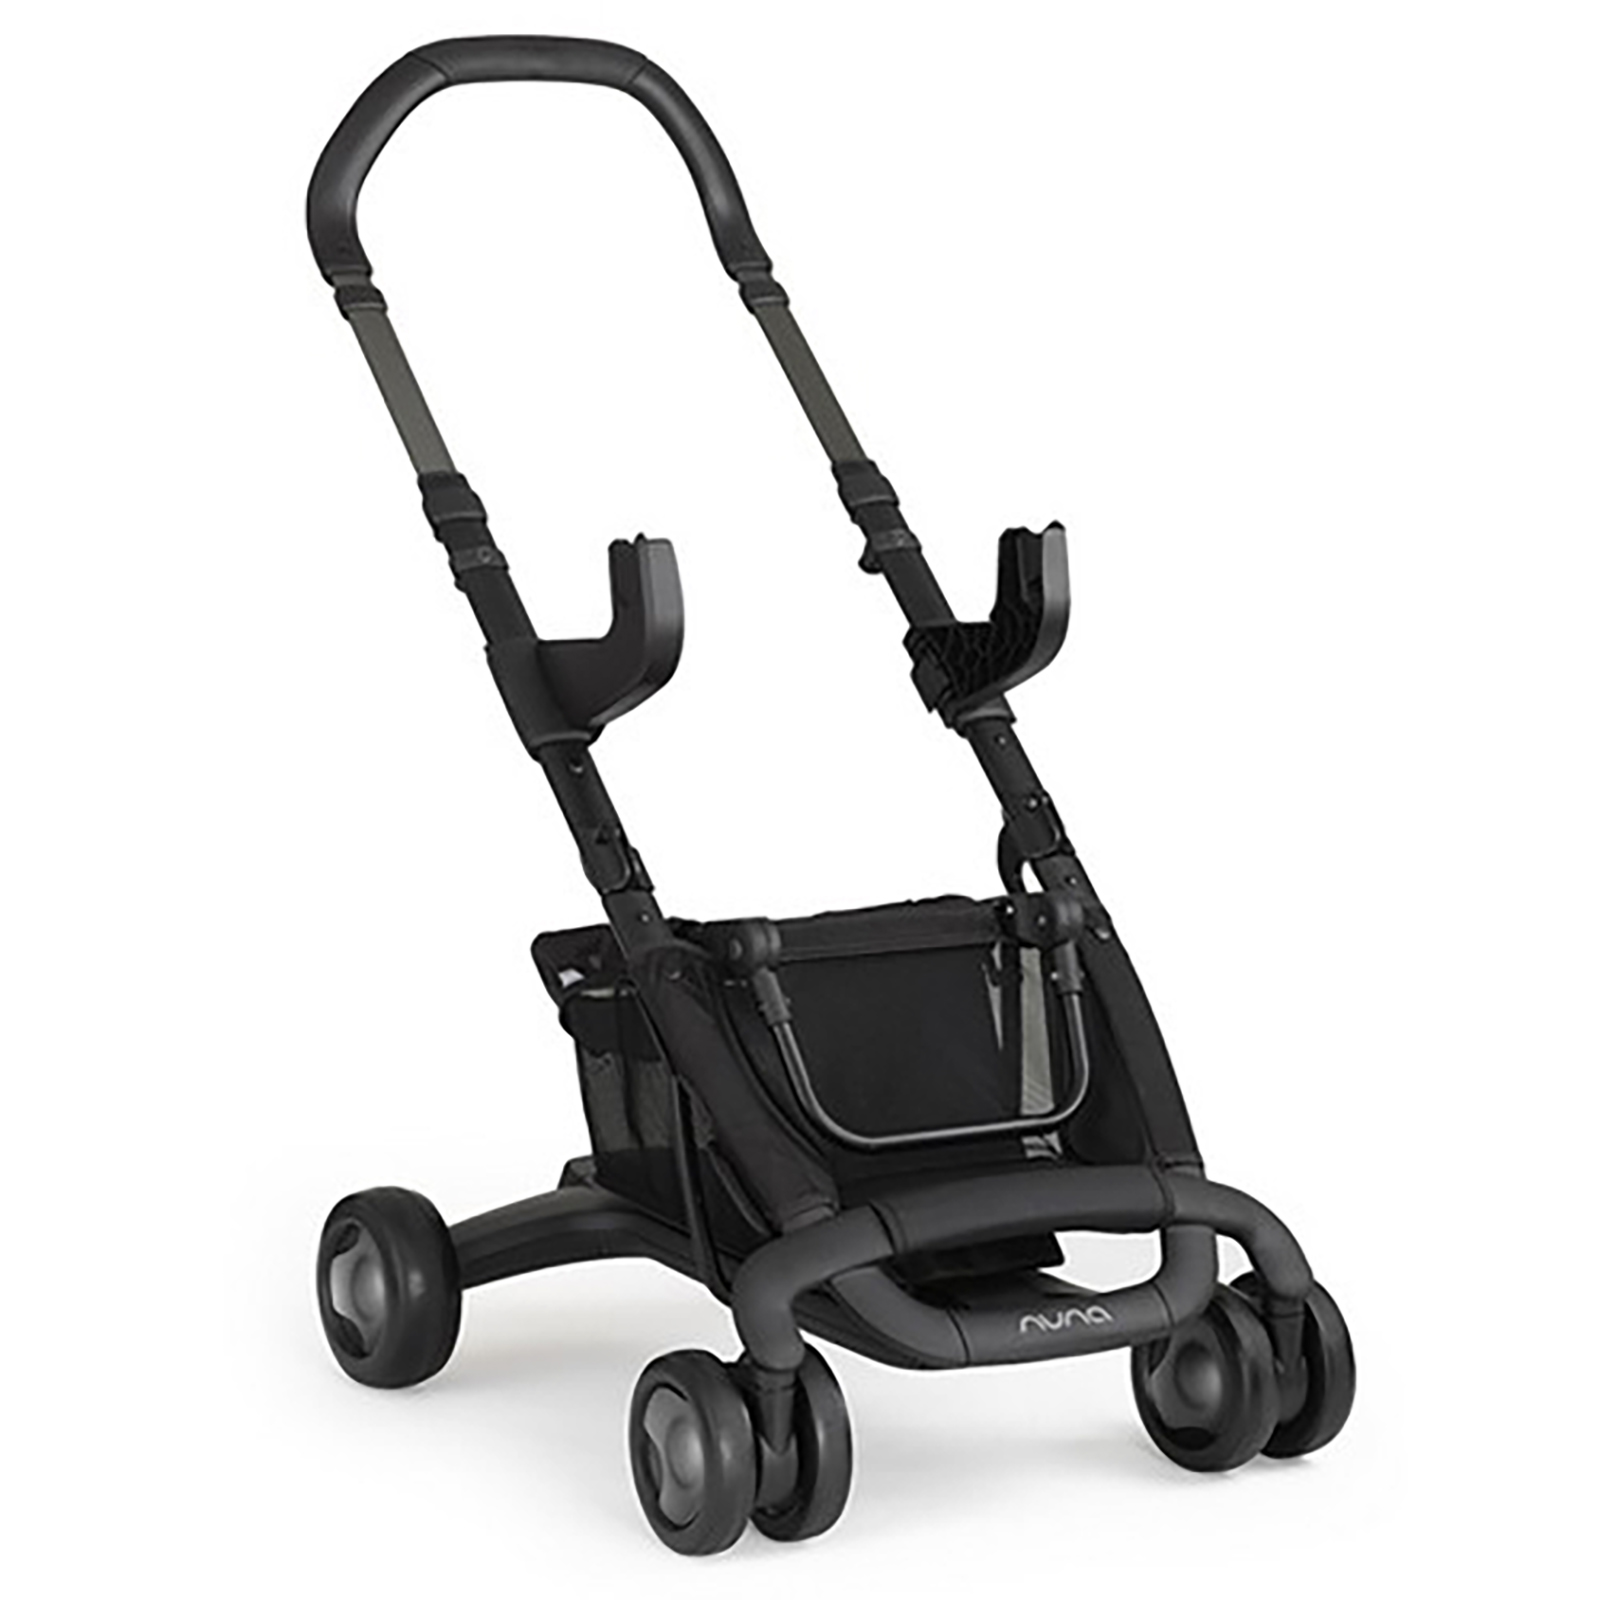 Nuna Pepp Pepp Luxx Car Seat Adapters Buy At Online4baby